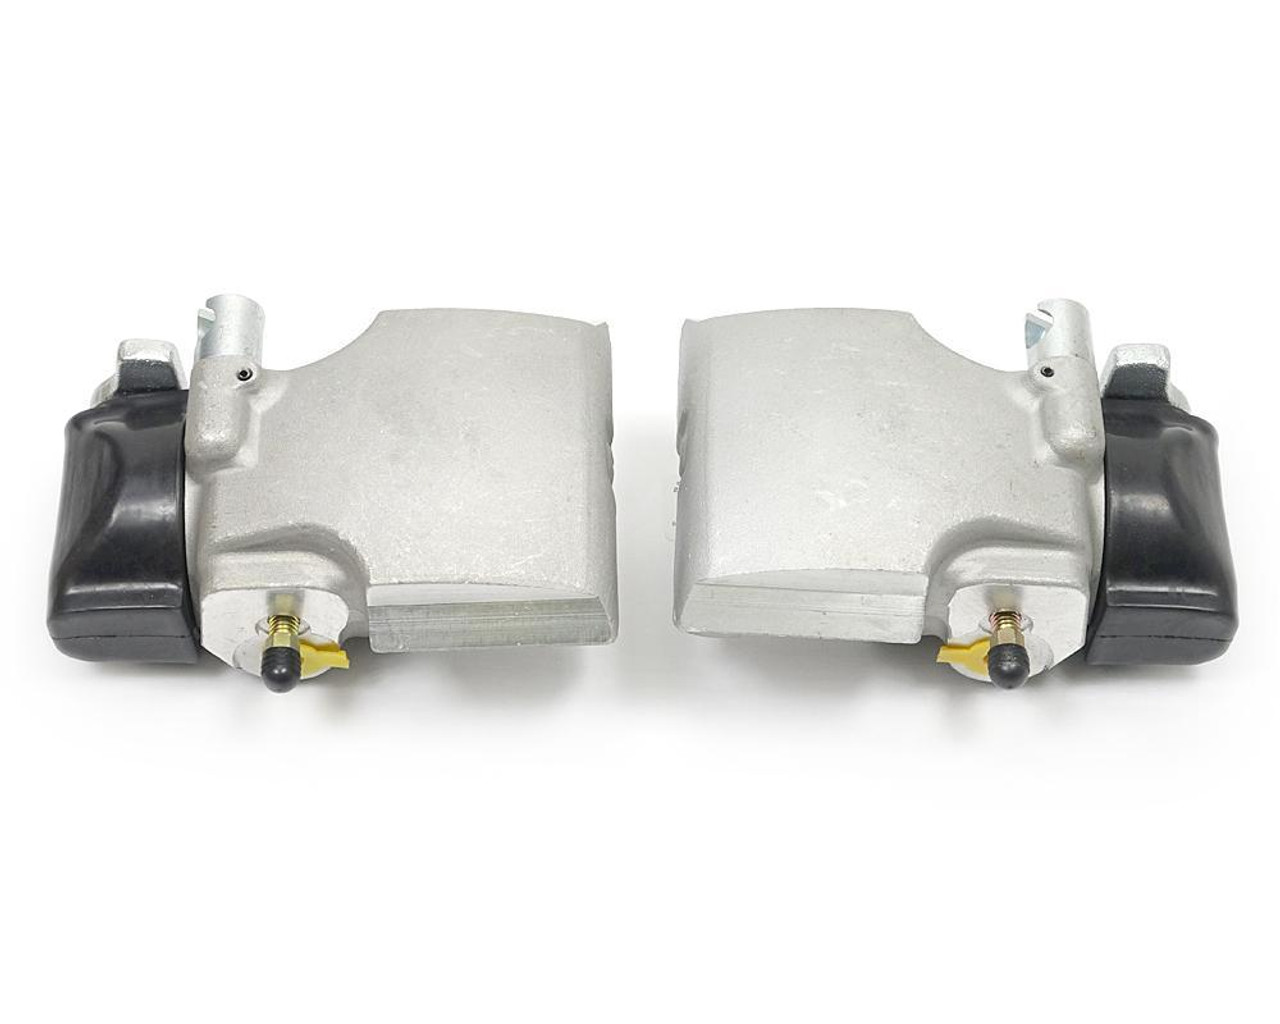 Performance Rear Brake Caliper Pair - NEW